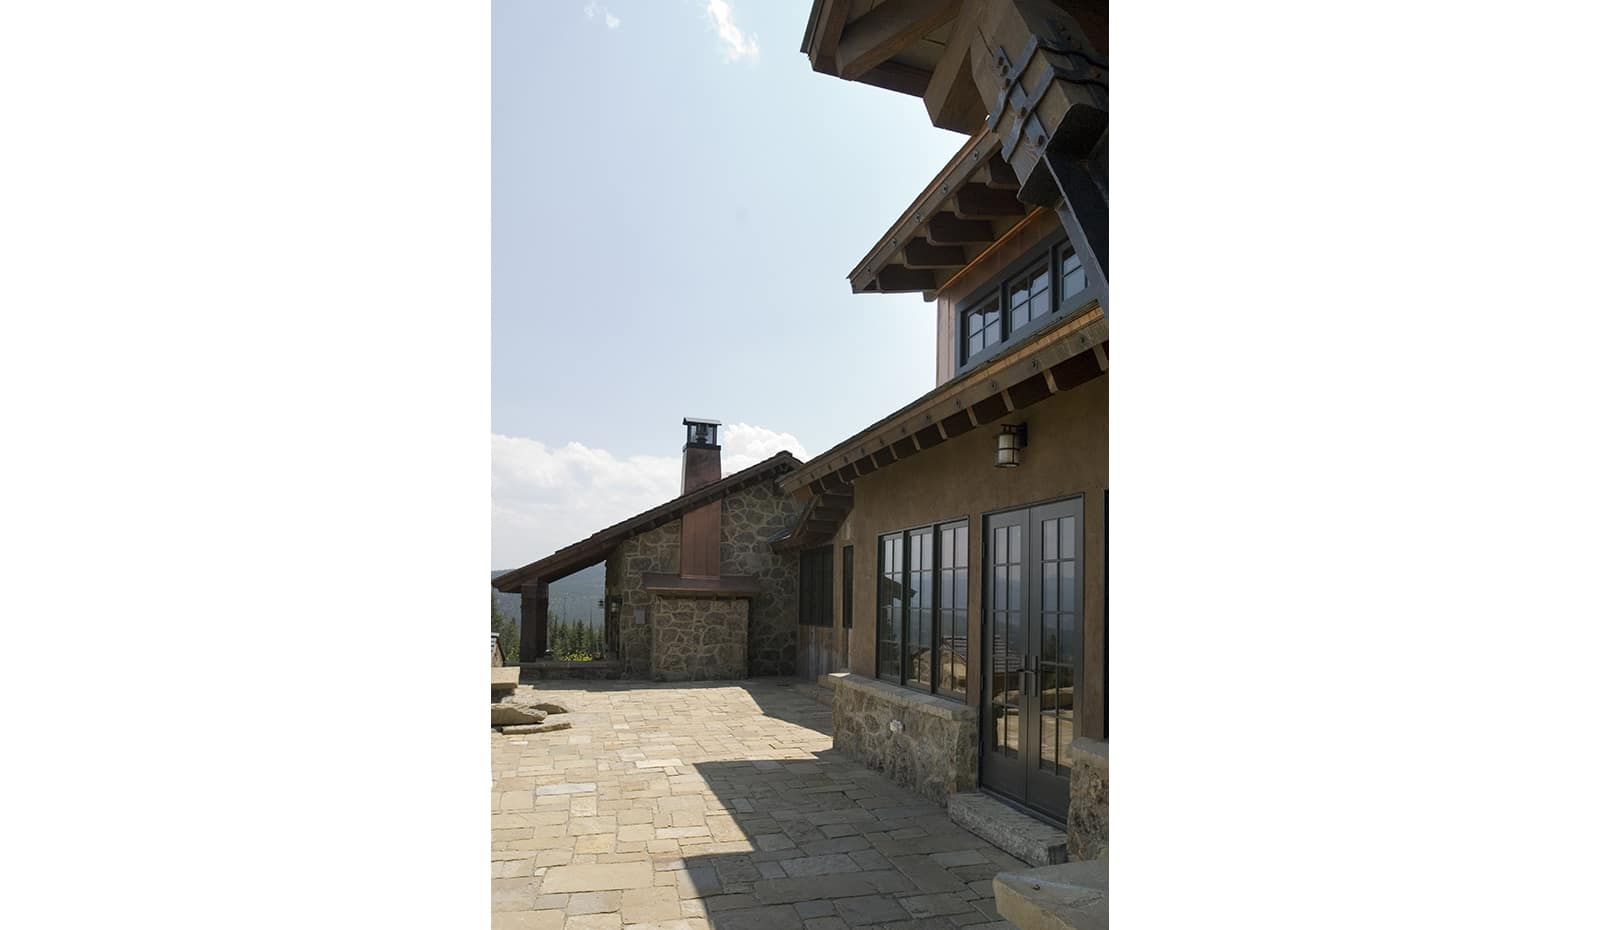 TuscanFarm_1_1600x930